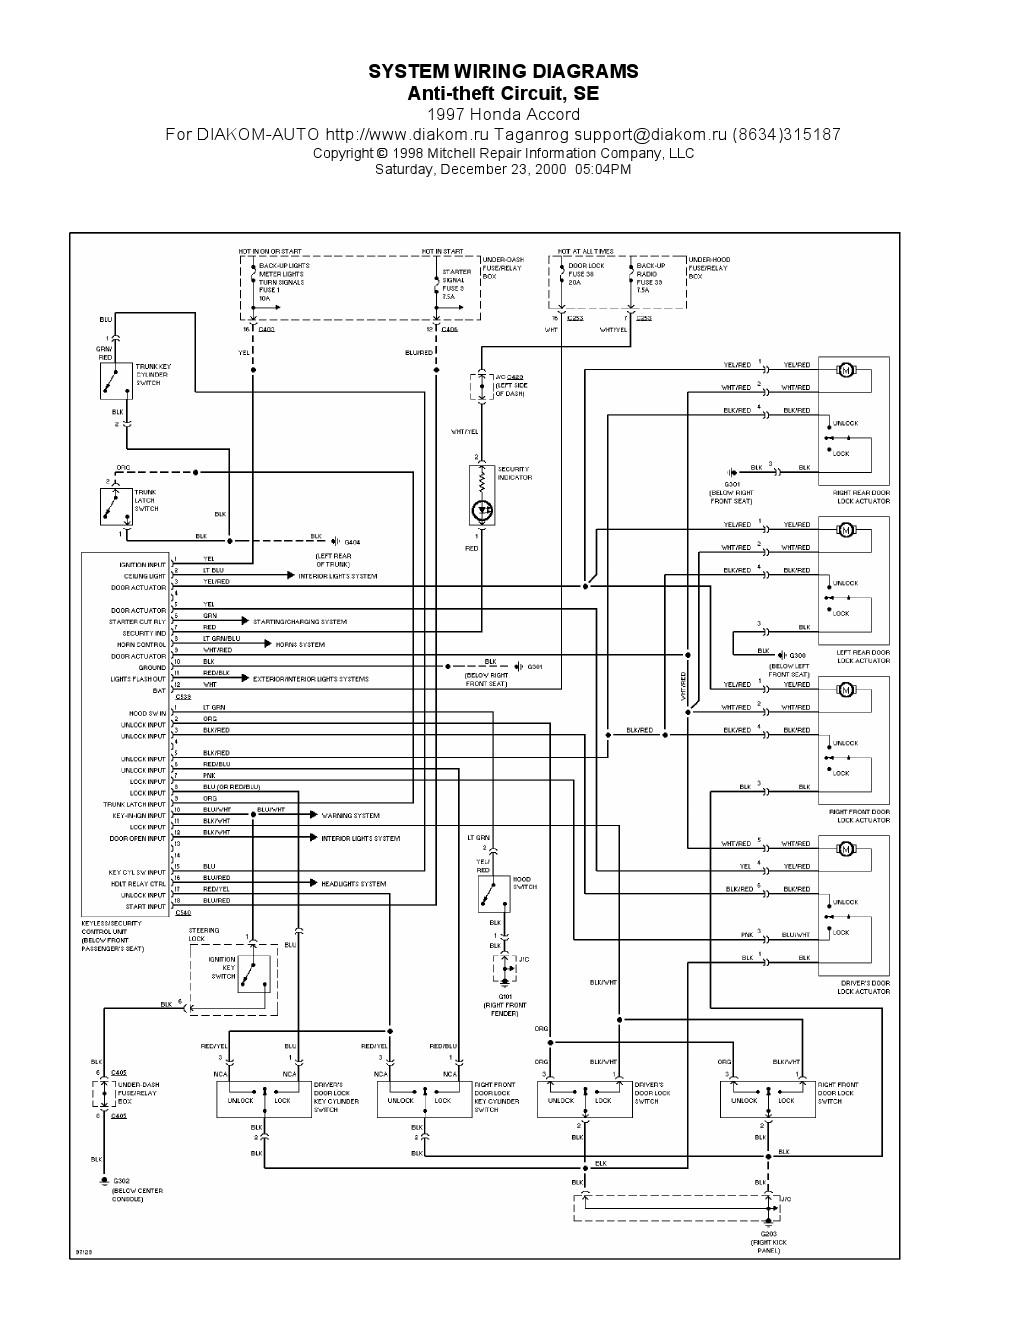 Wiring Diagram Honda Mr50 Electrical Diagrams Cb650 C105 Schematics